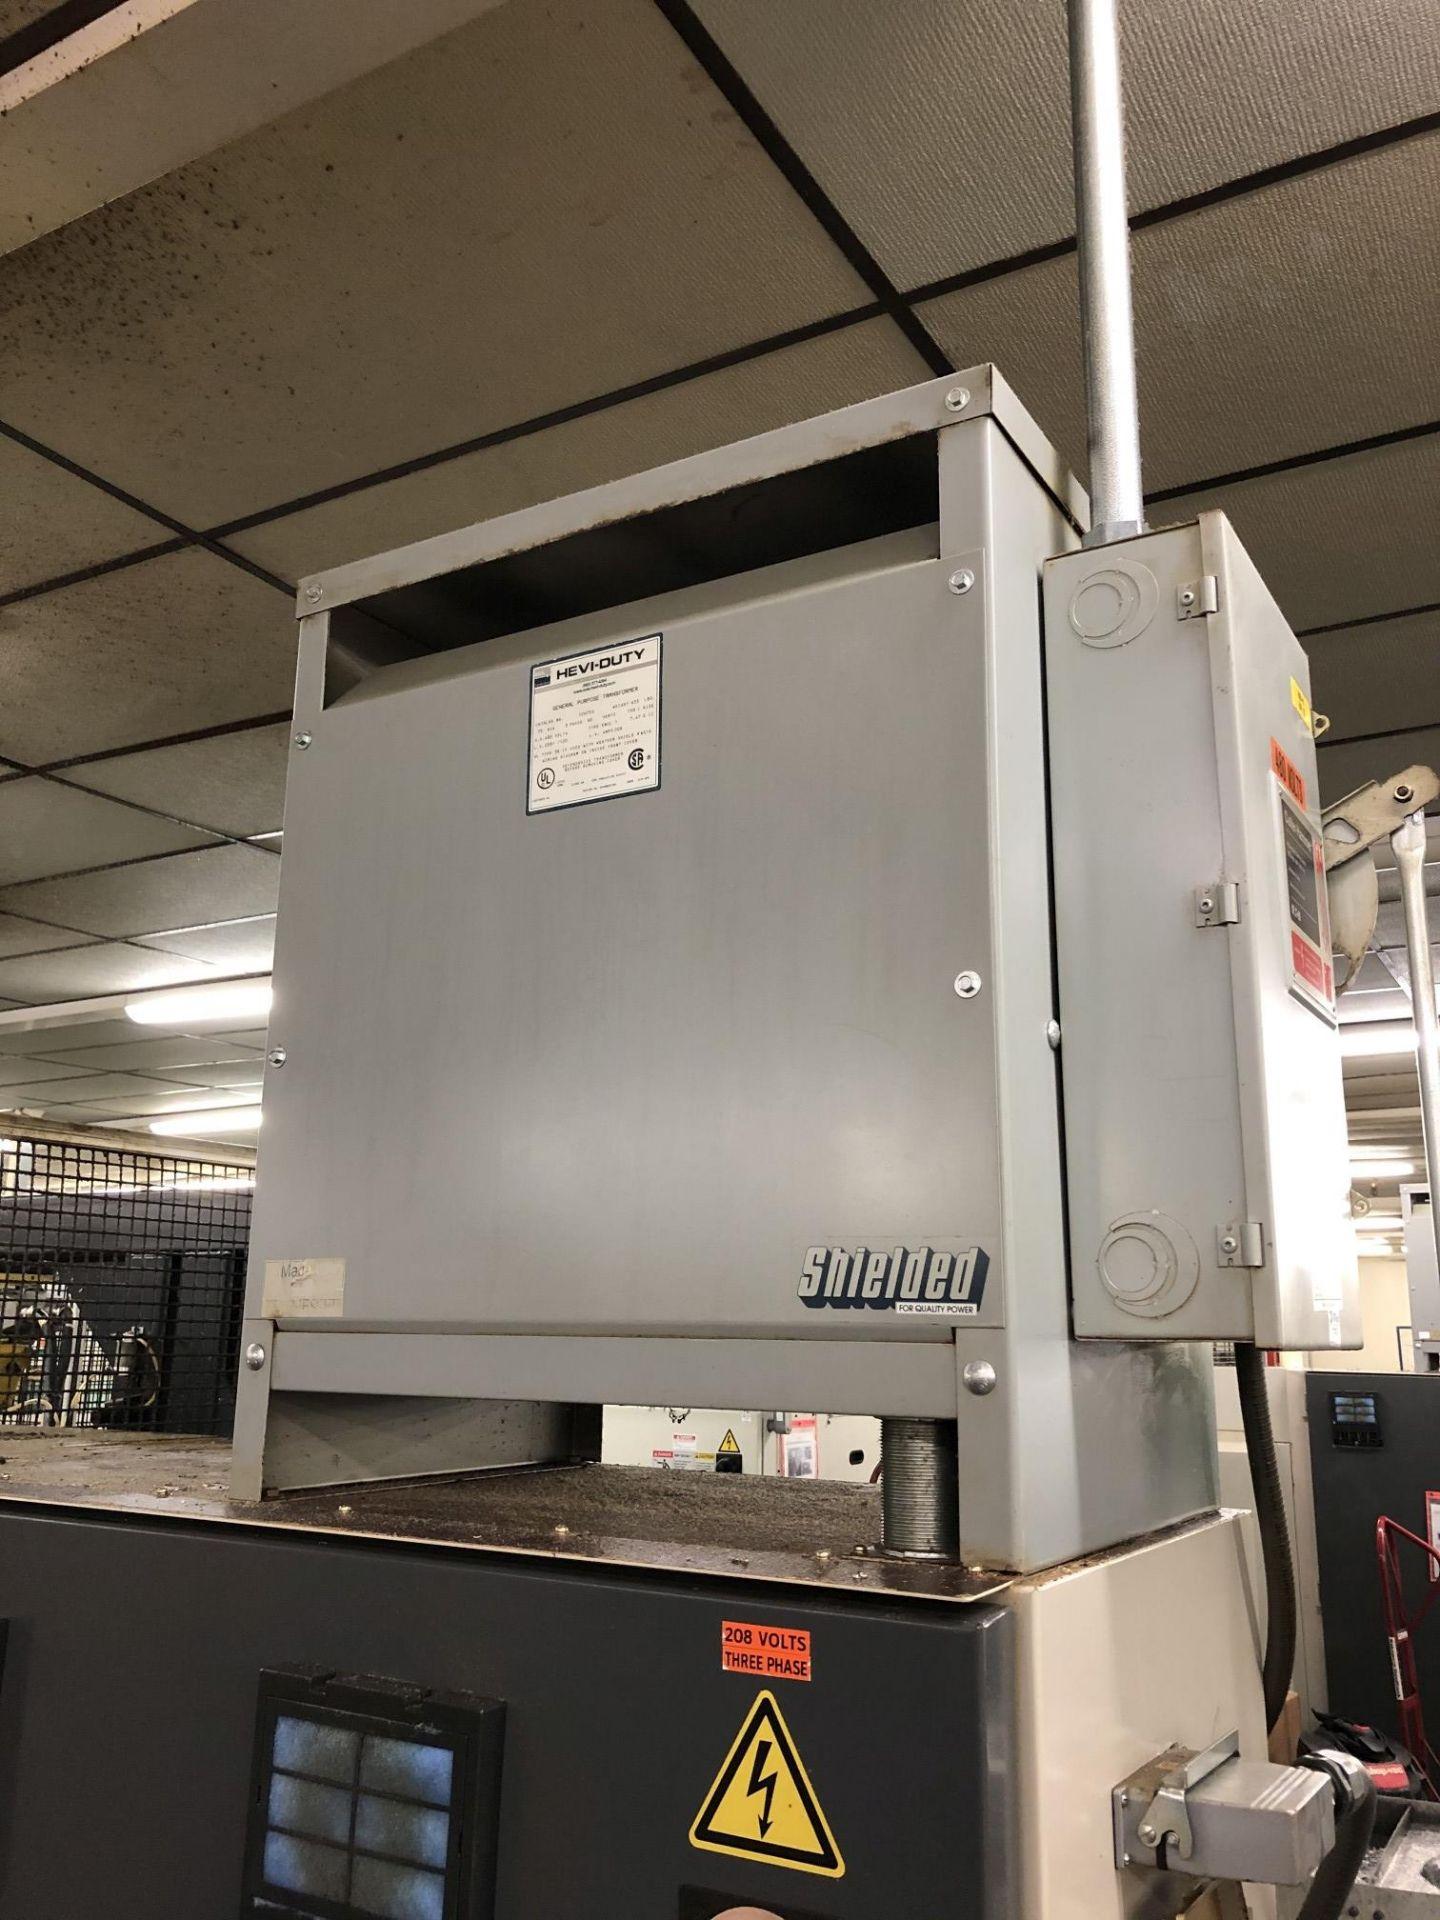 1999 Kitako MT4-200M Multi-Spindle CNC Turning Mill - Image 12 of 15